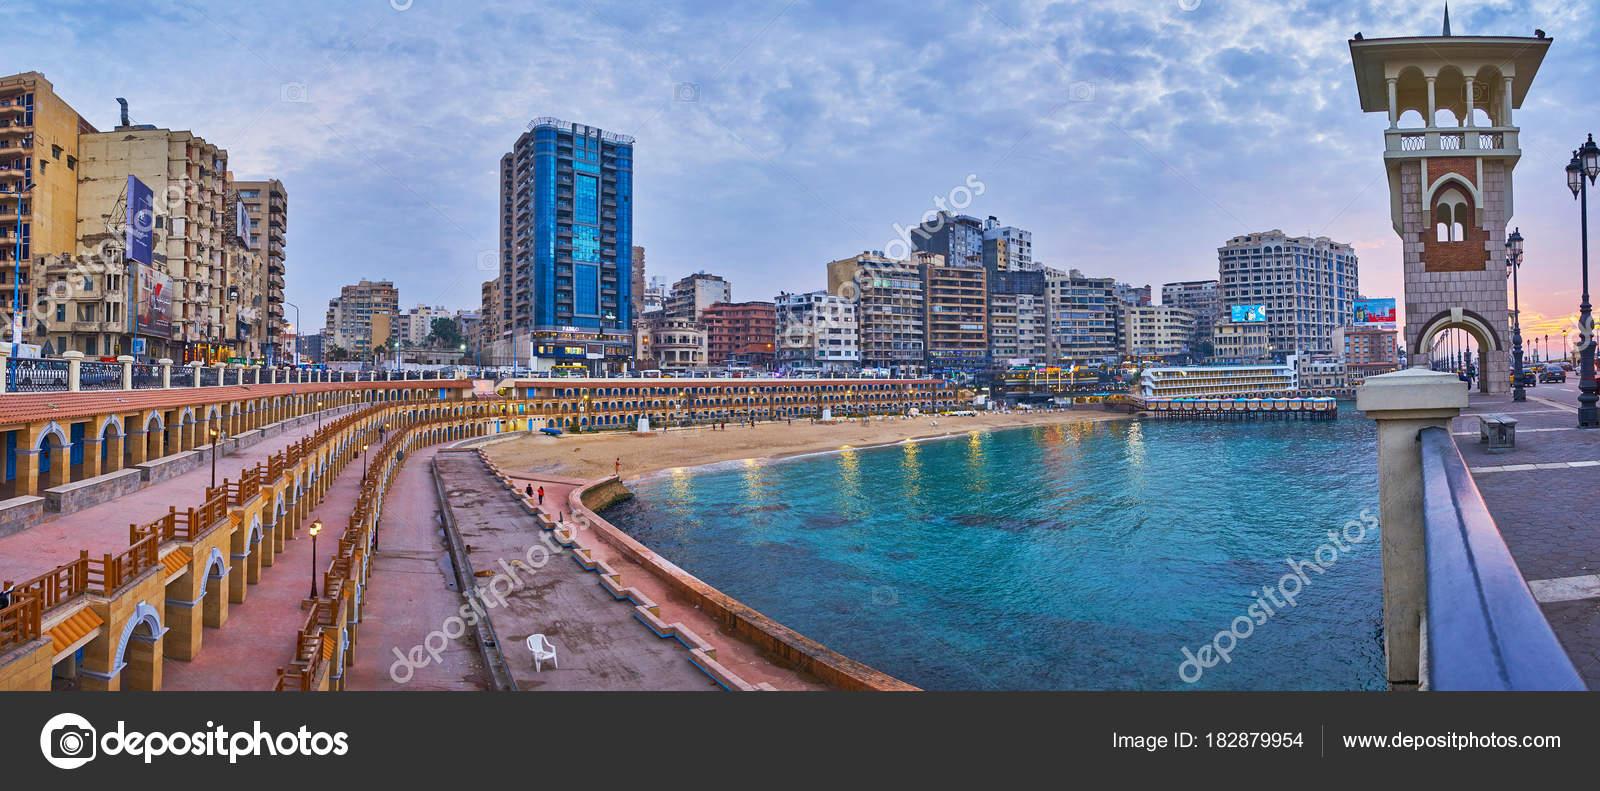 Alexandria dating Egypten